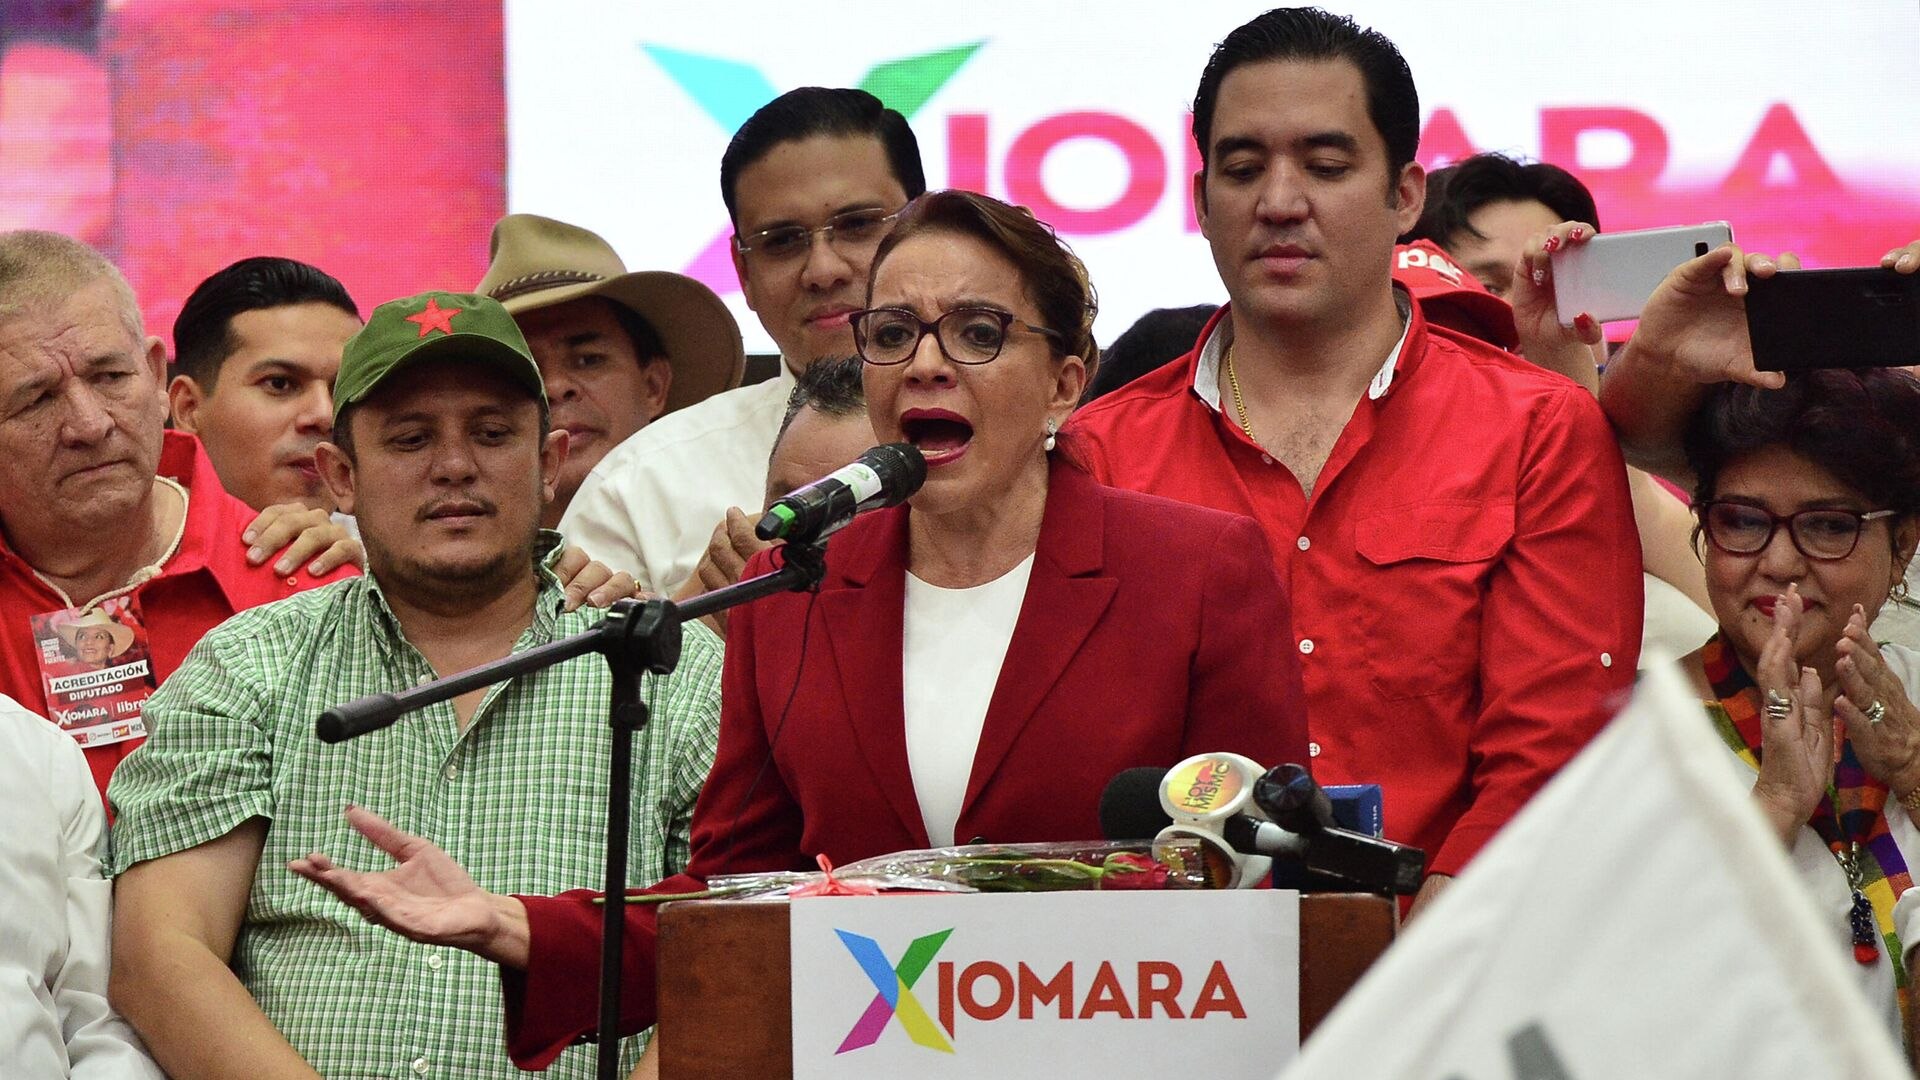 Xiomara Castro, candidata presidenncial hondureña - Sputnik Mundo, 1920, 22.03.2021